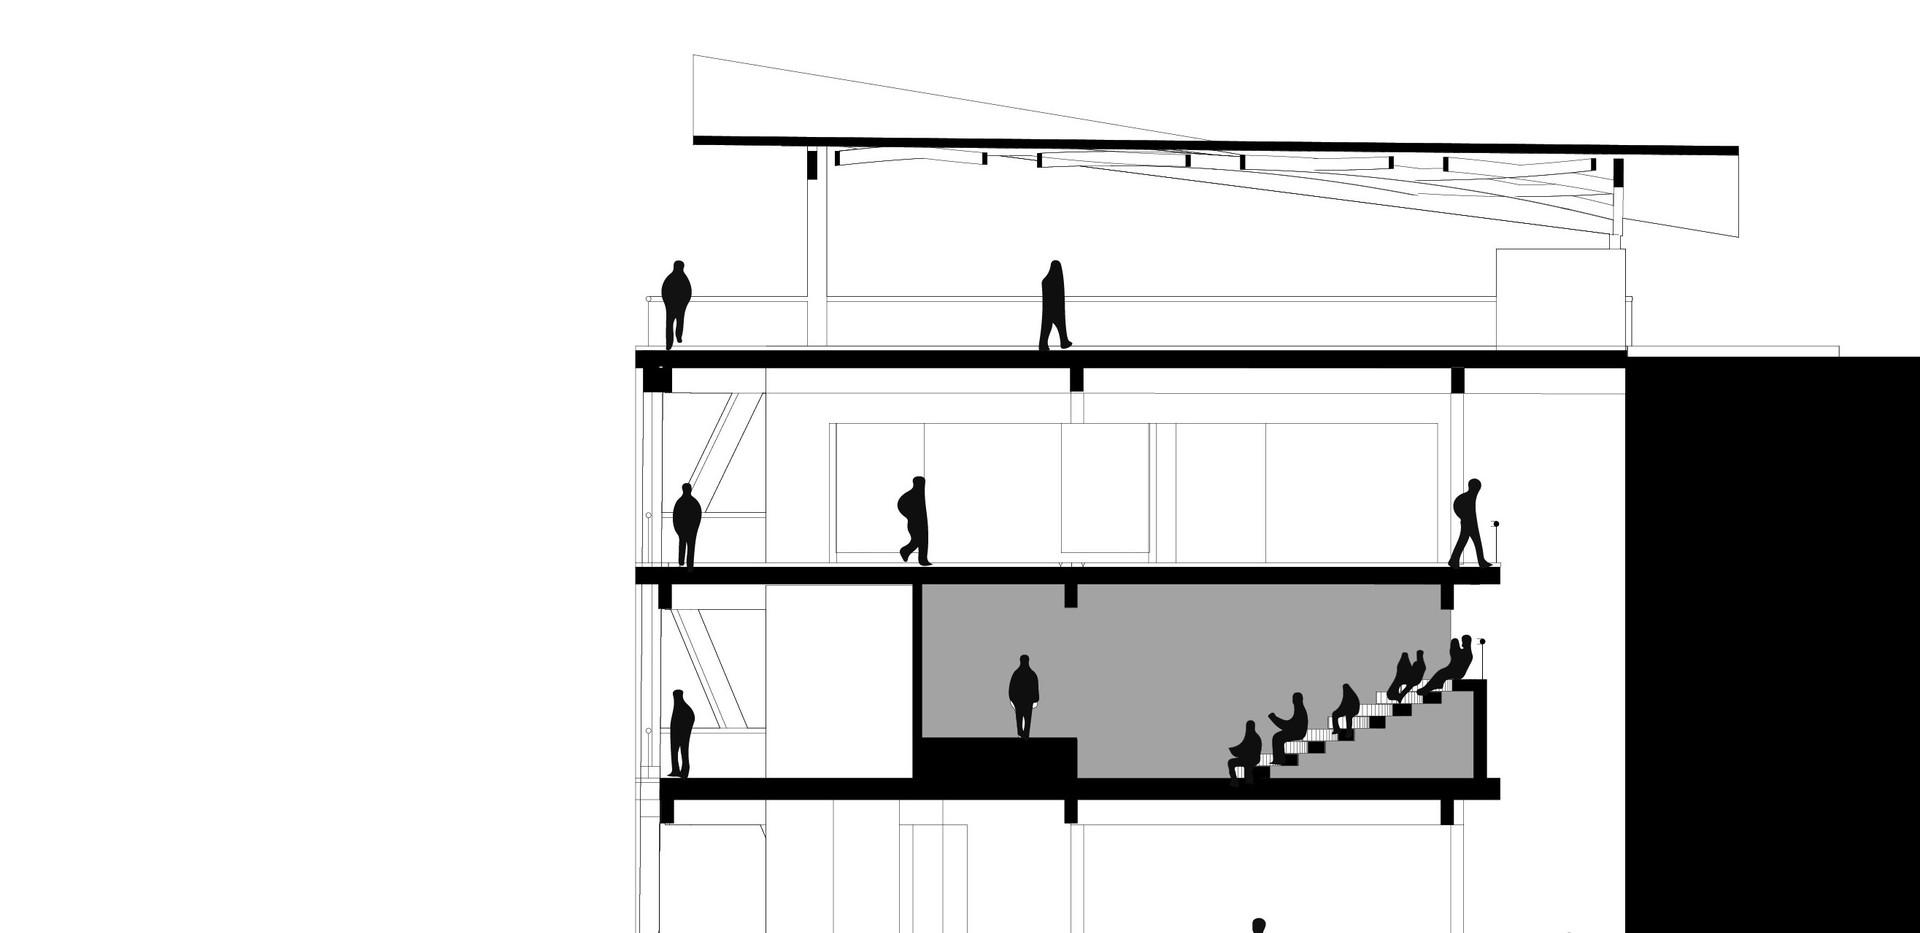 rw short section 2 [Converted].jpg